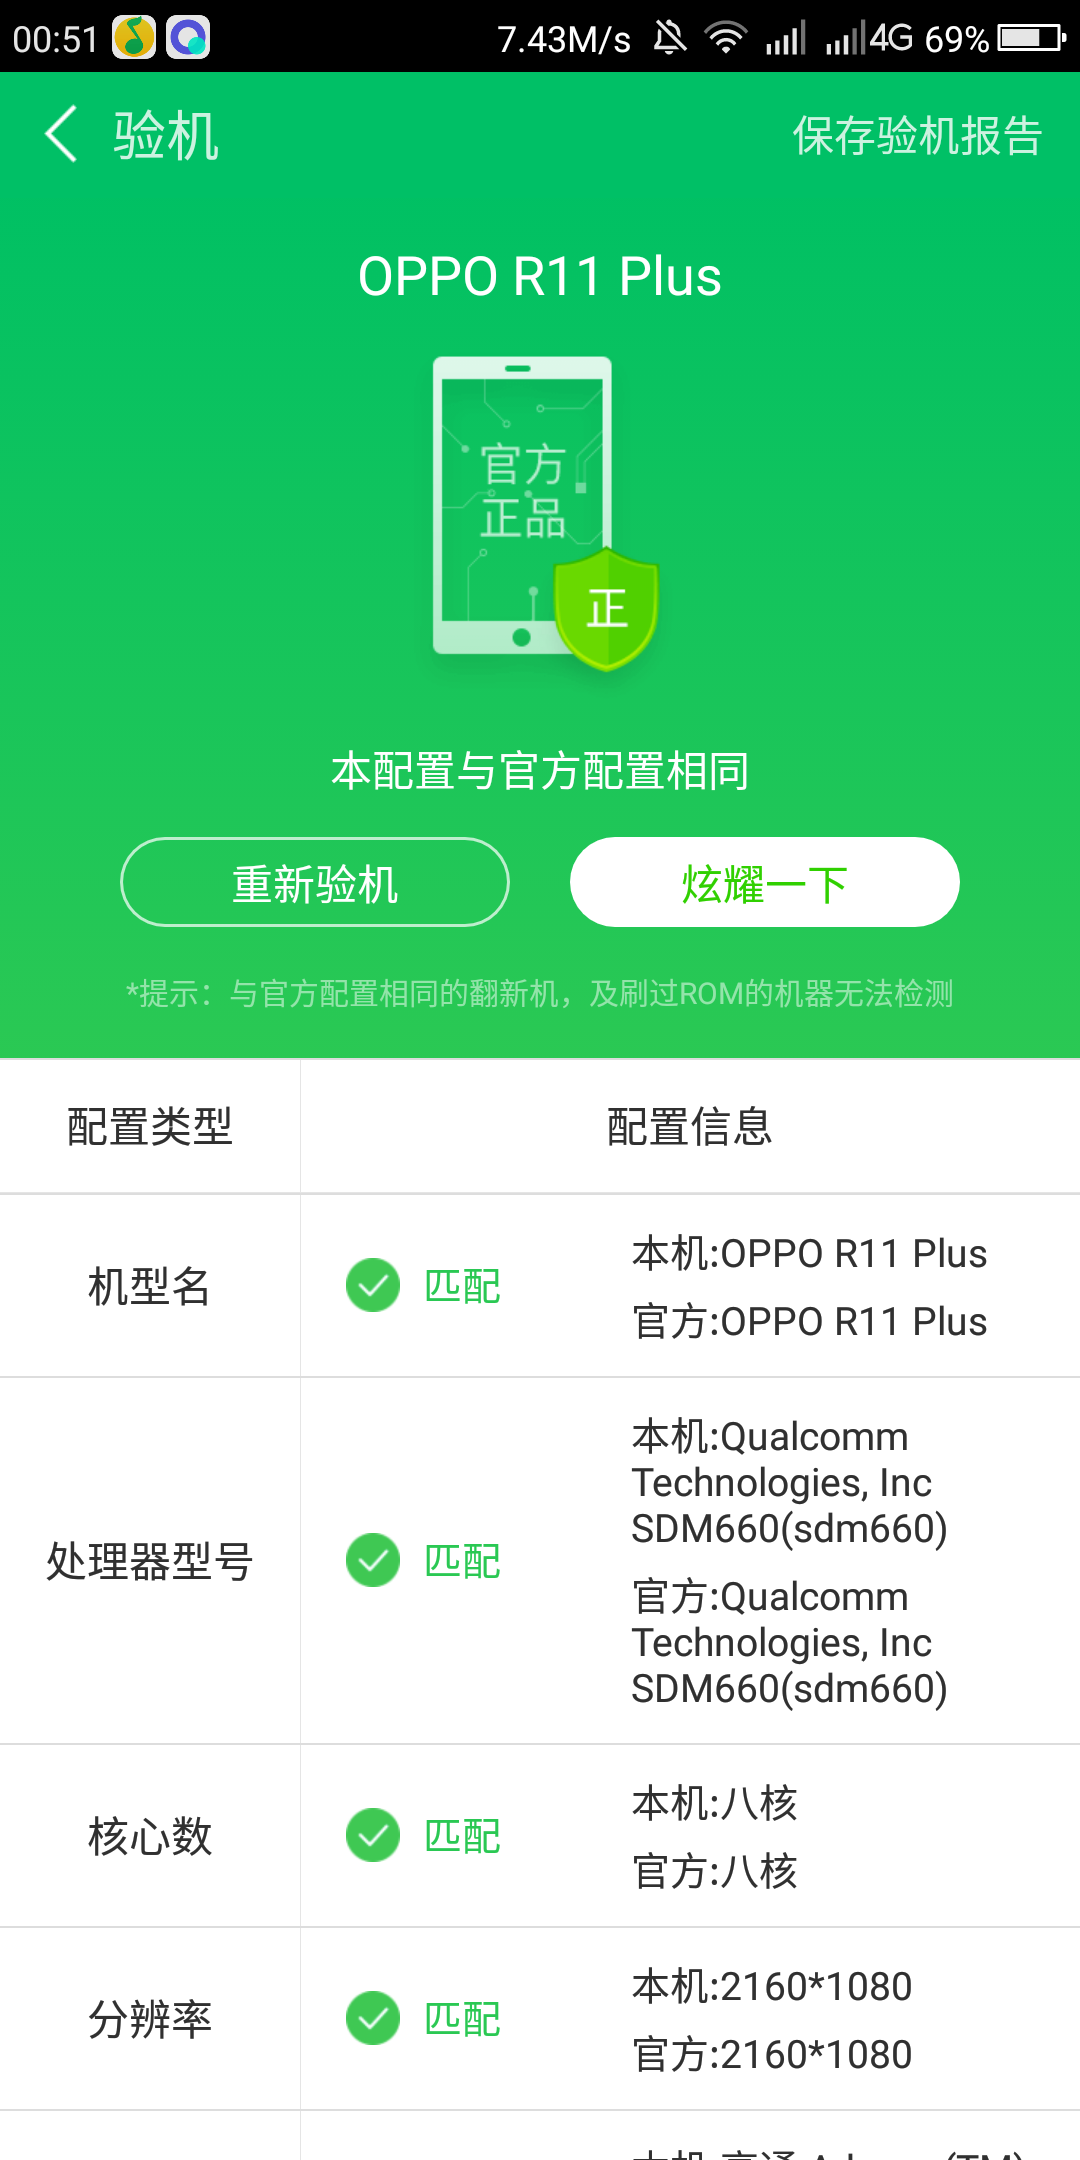 Screenshot_2018-07-11-00-52-00.png